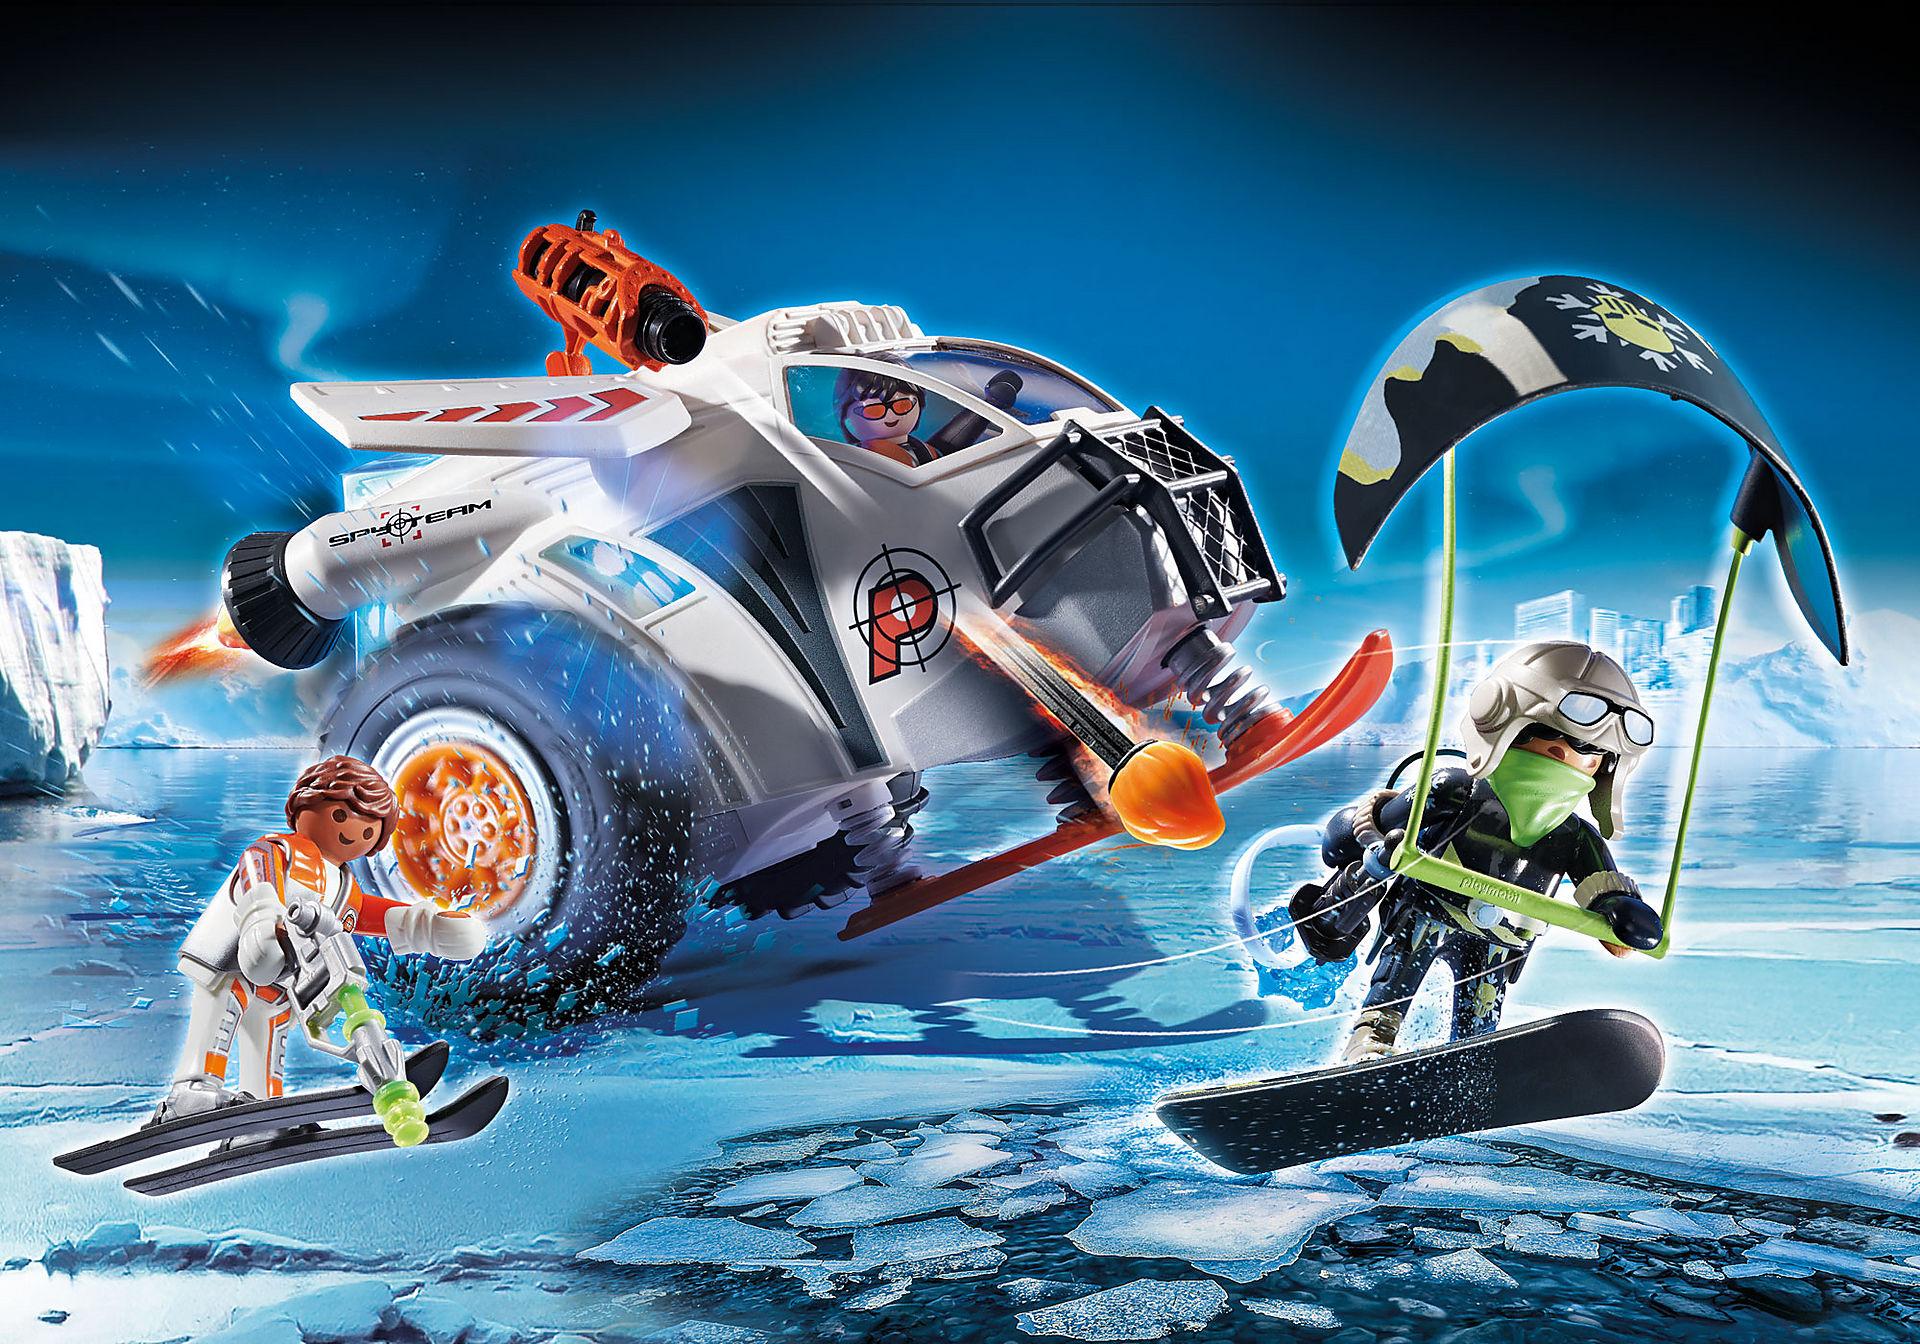 70231 Spy Team Snow Glider zoom image1